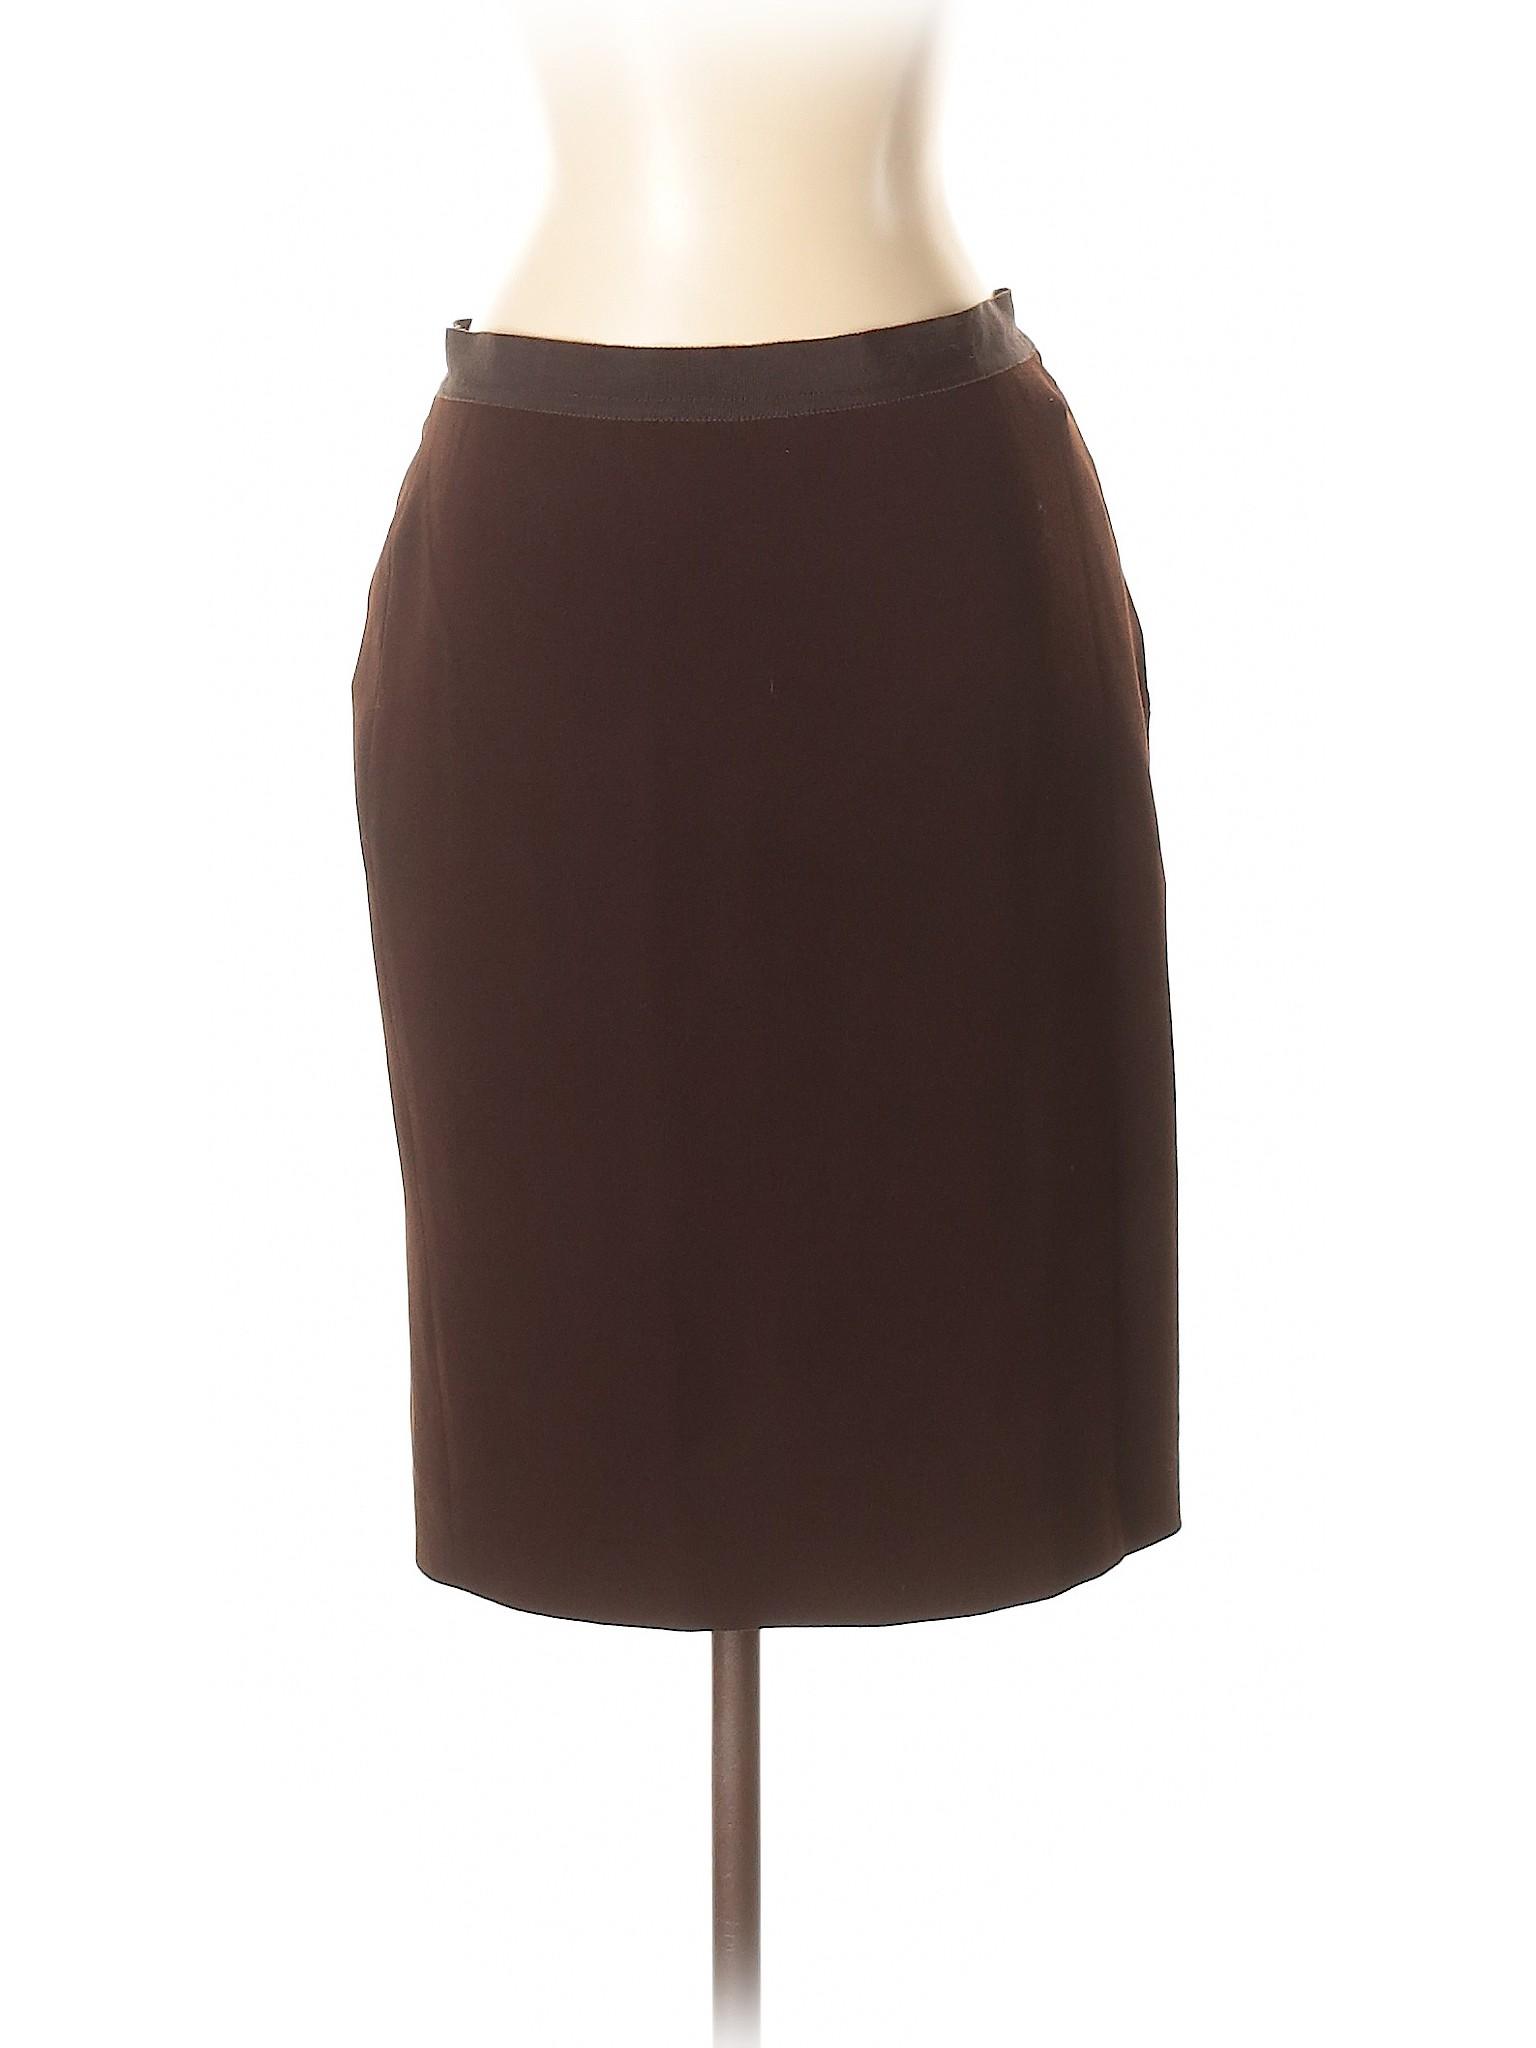 Paul Wool Skirt Boutique leisure Gaultier Jean Hq7Ac7EfwW